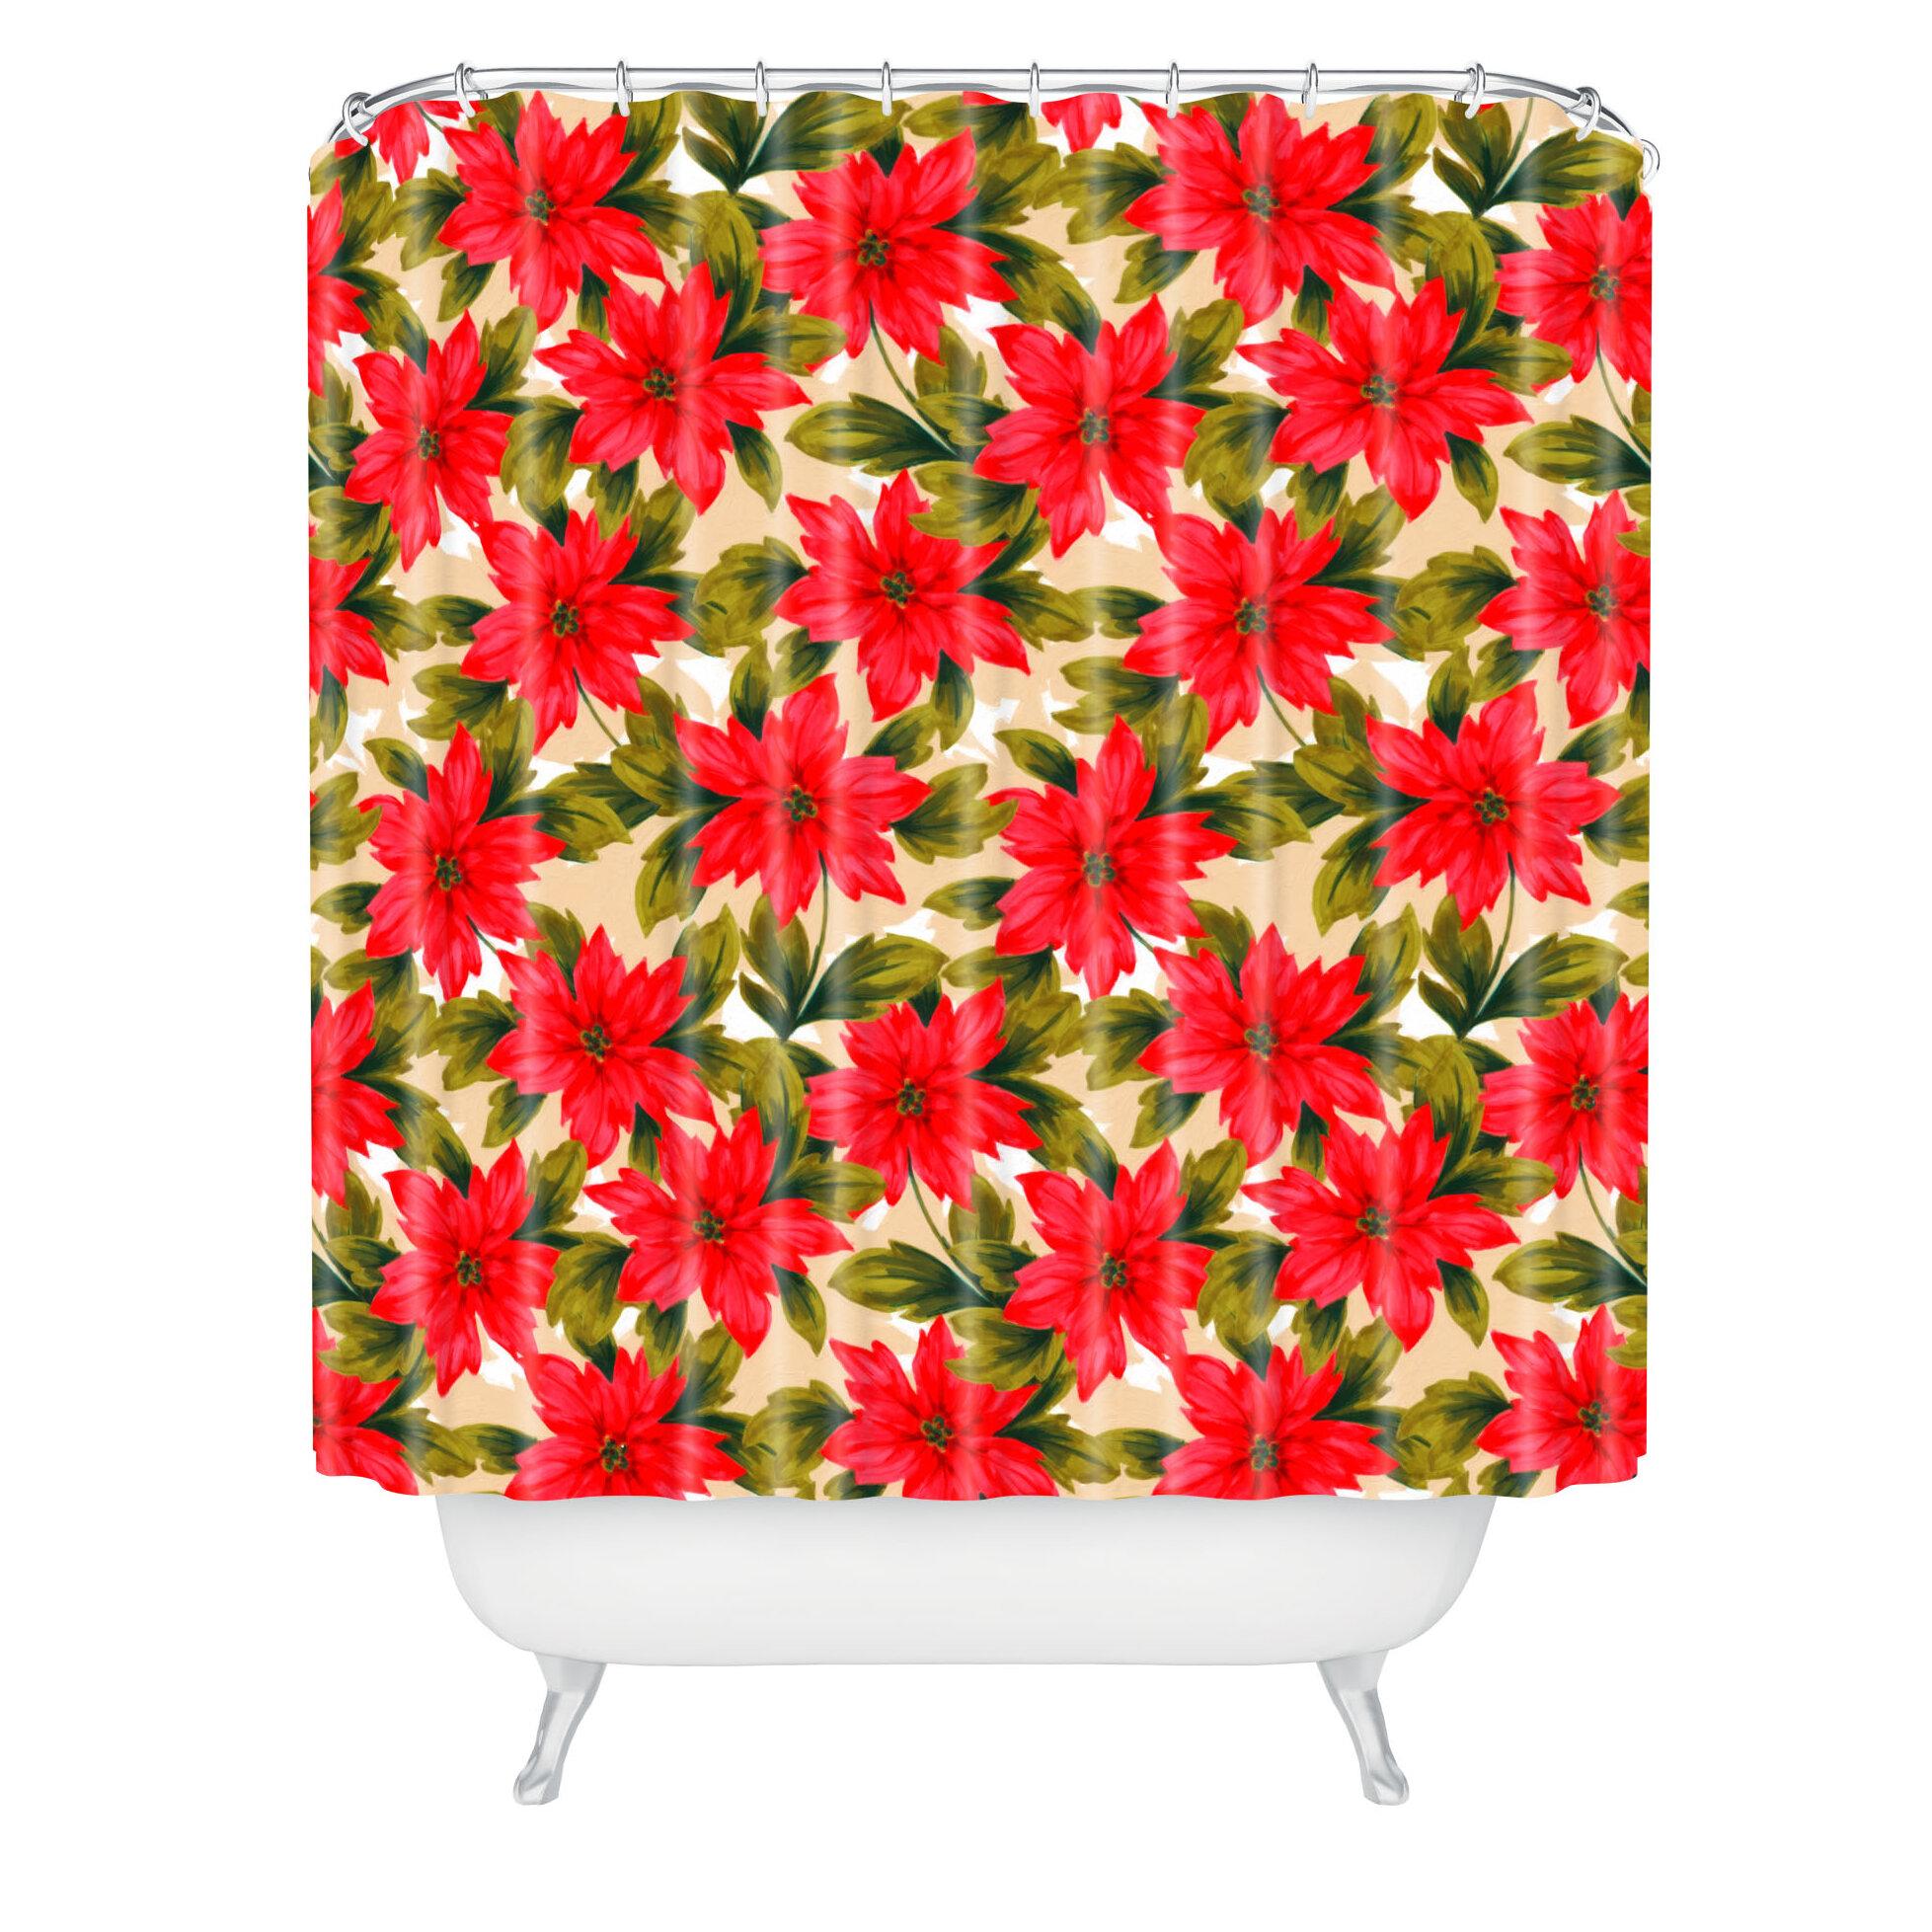 The Holiday Aisle Jade Poinsettia Shower Curtain U0026 Reviews | Wayfair